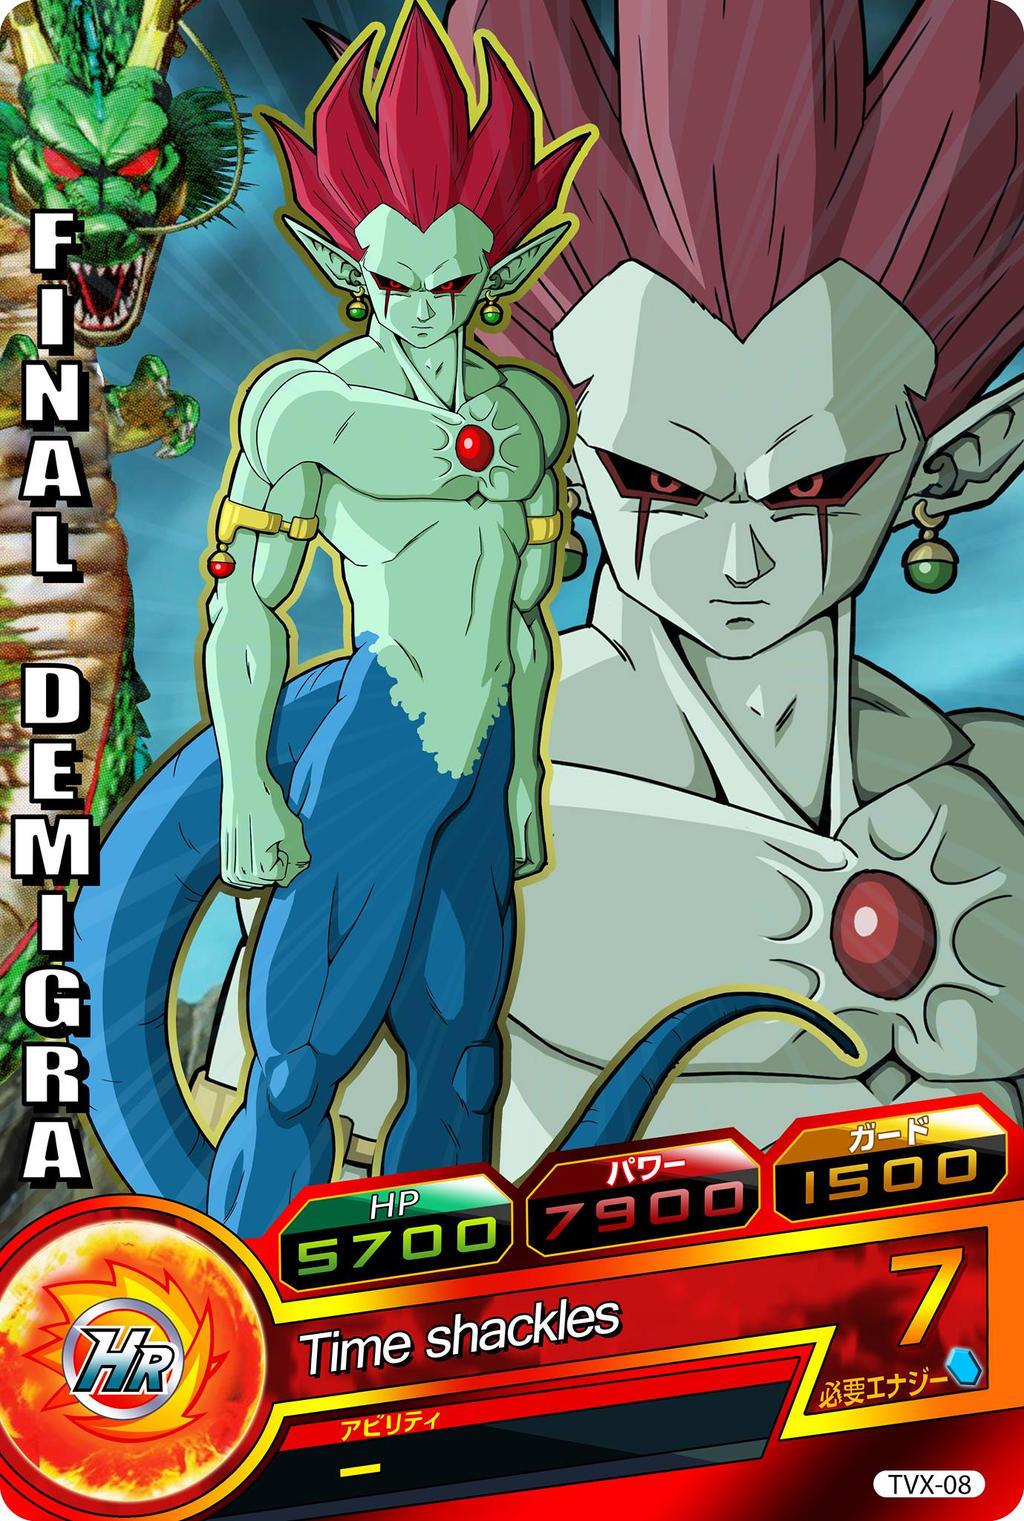 Final Demigra (Dragon Ball Heroes fancard) by Nostal on DeviantArt